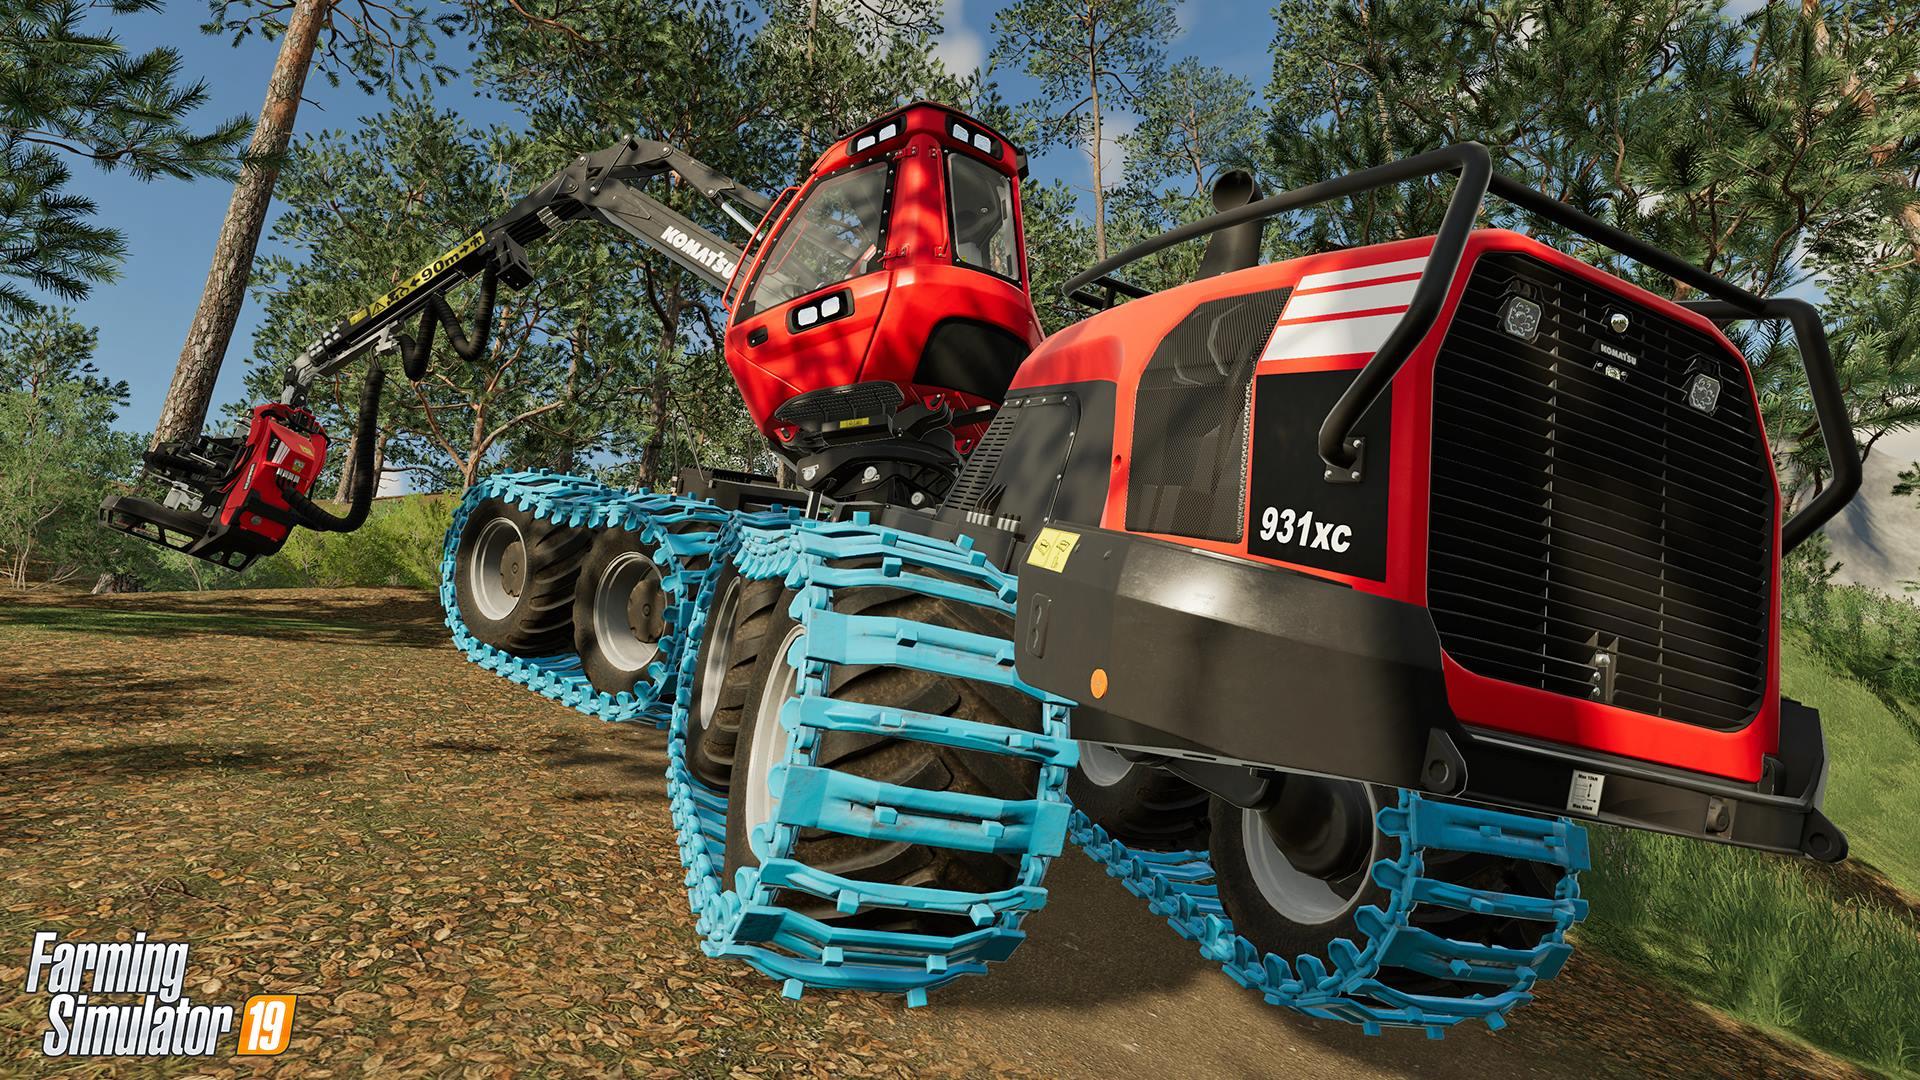 FS19 Komatsu Forest 931XC harvester in action - Farming